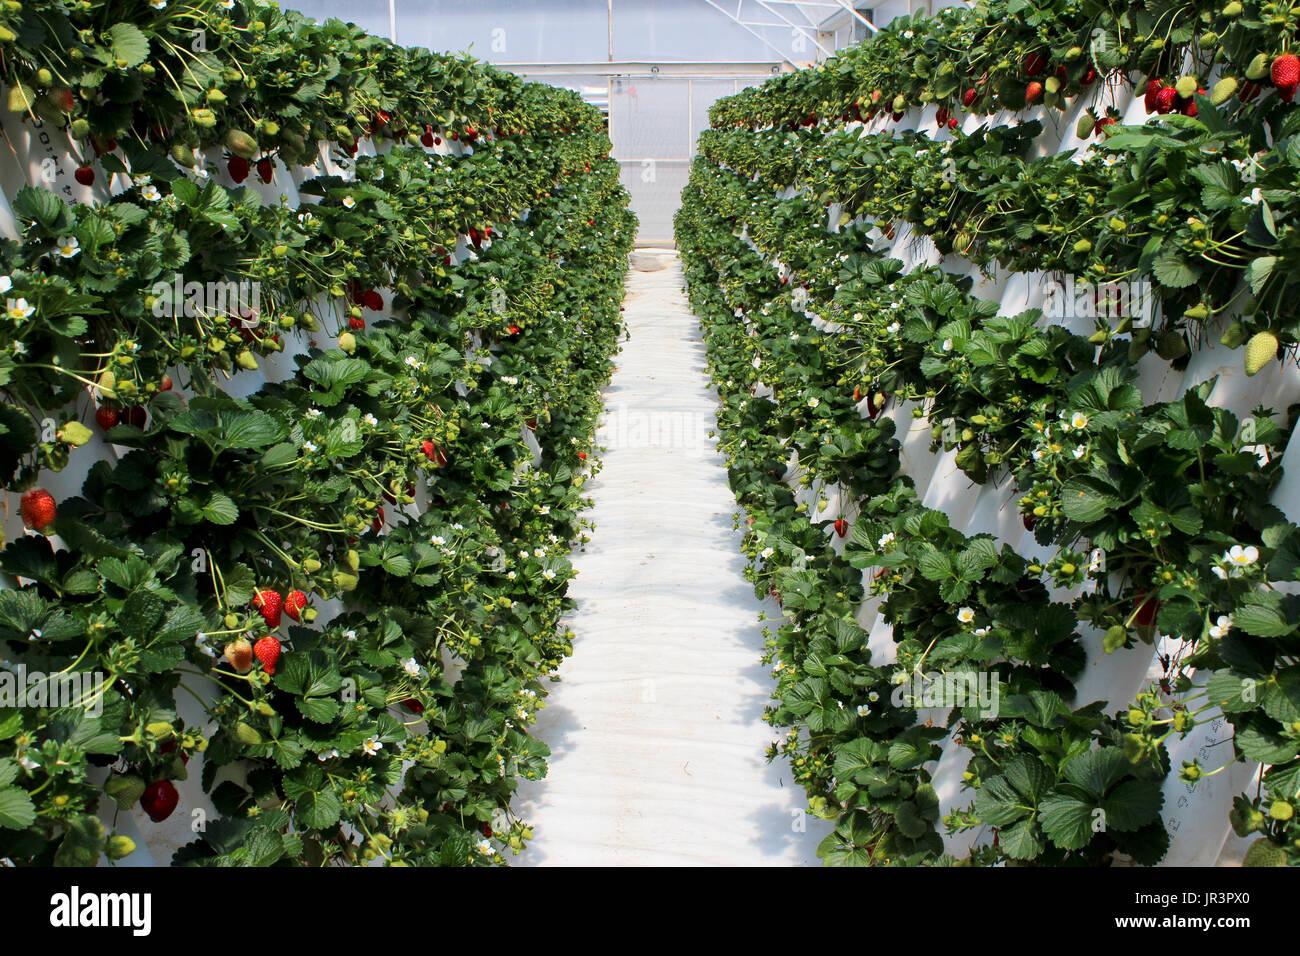 how to grow strawberries indoors lighting